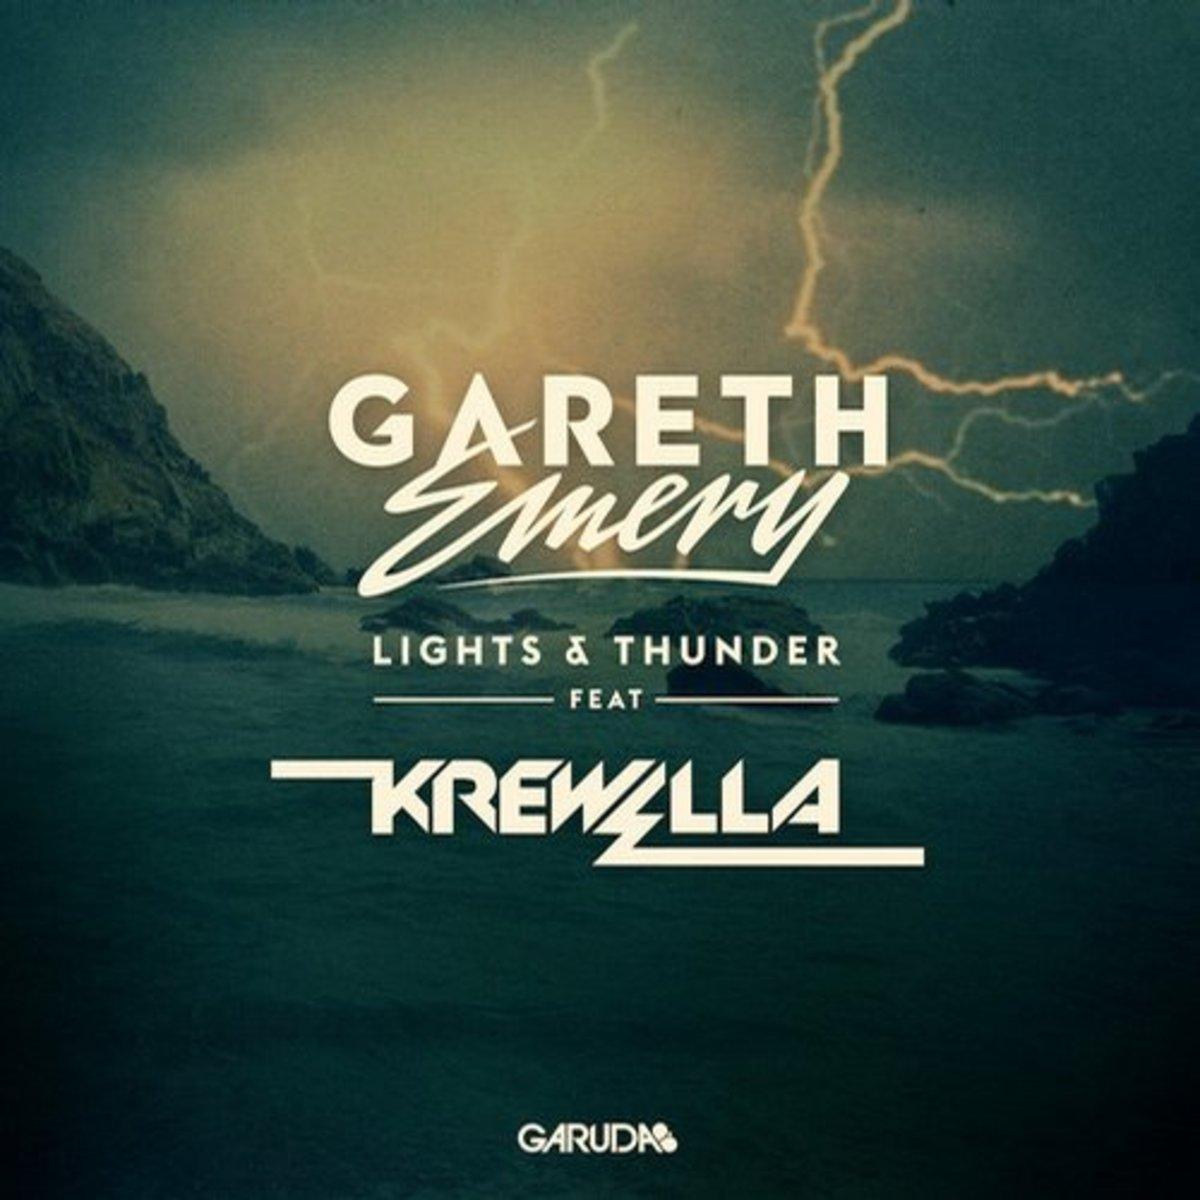 Gareth Emery Lights and Thunder ft Krewella